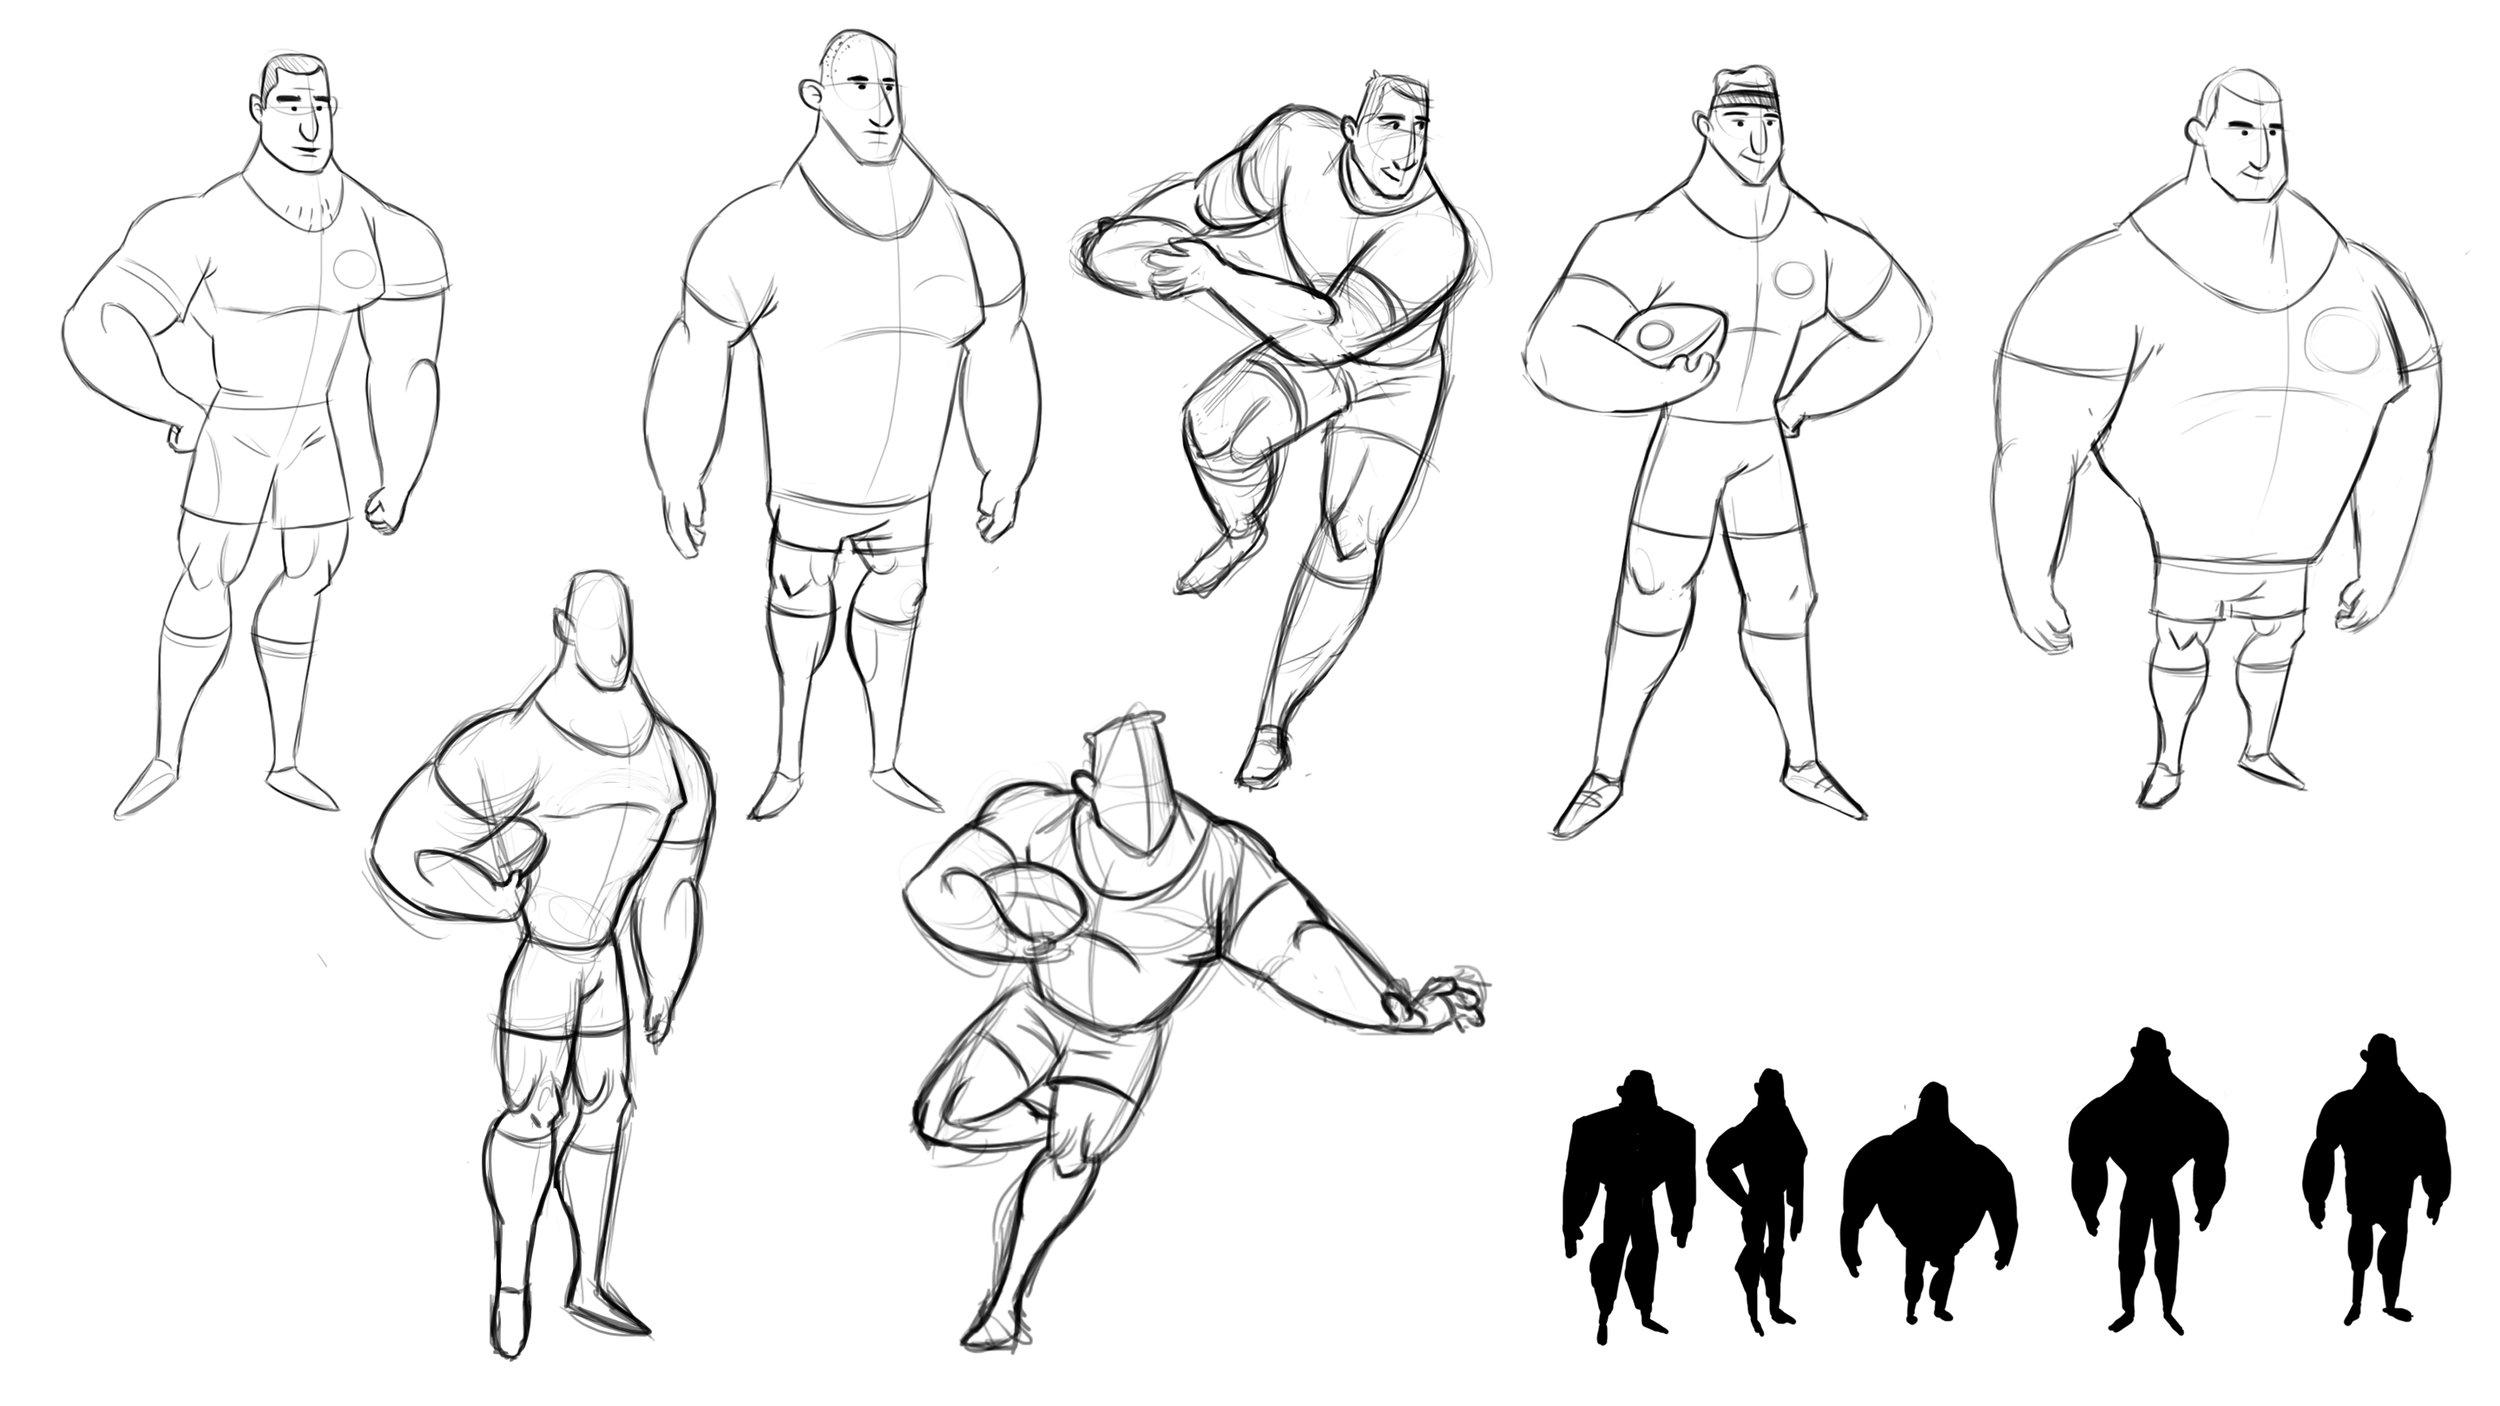 rough_sketches.jpg